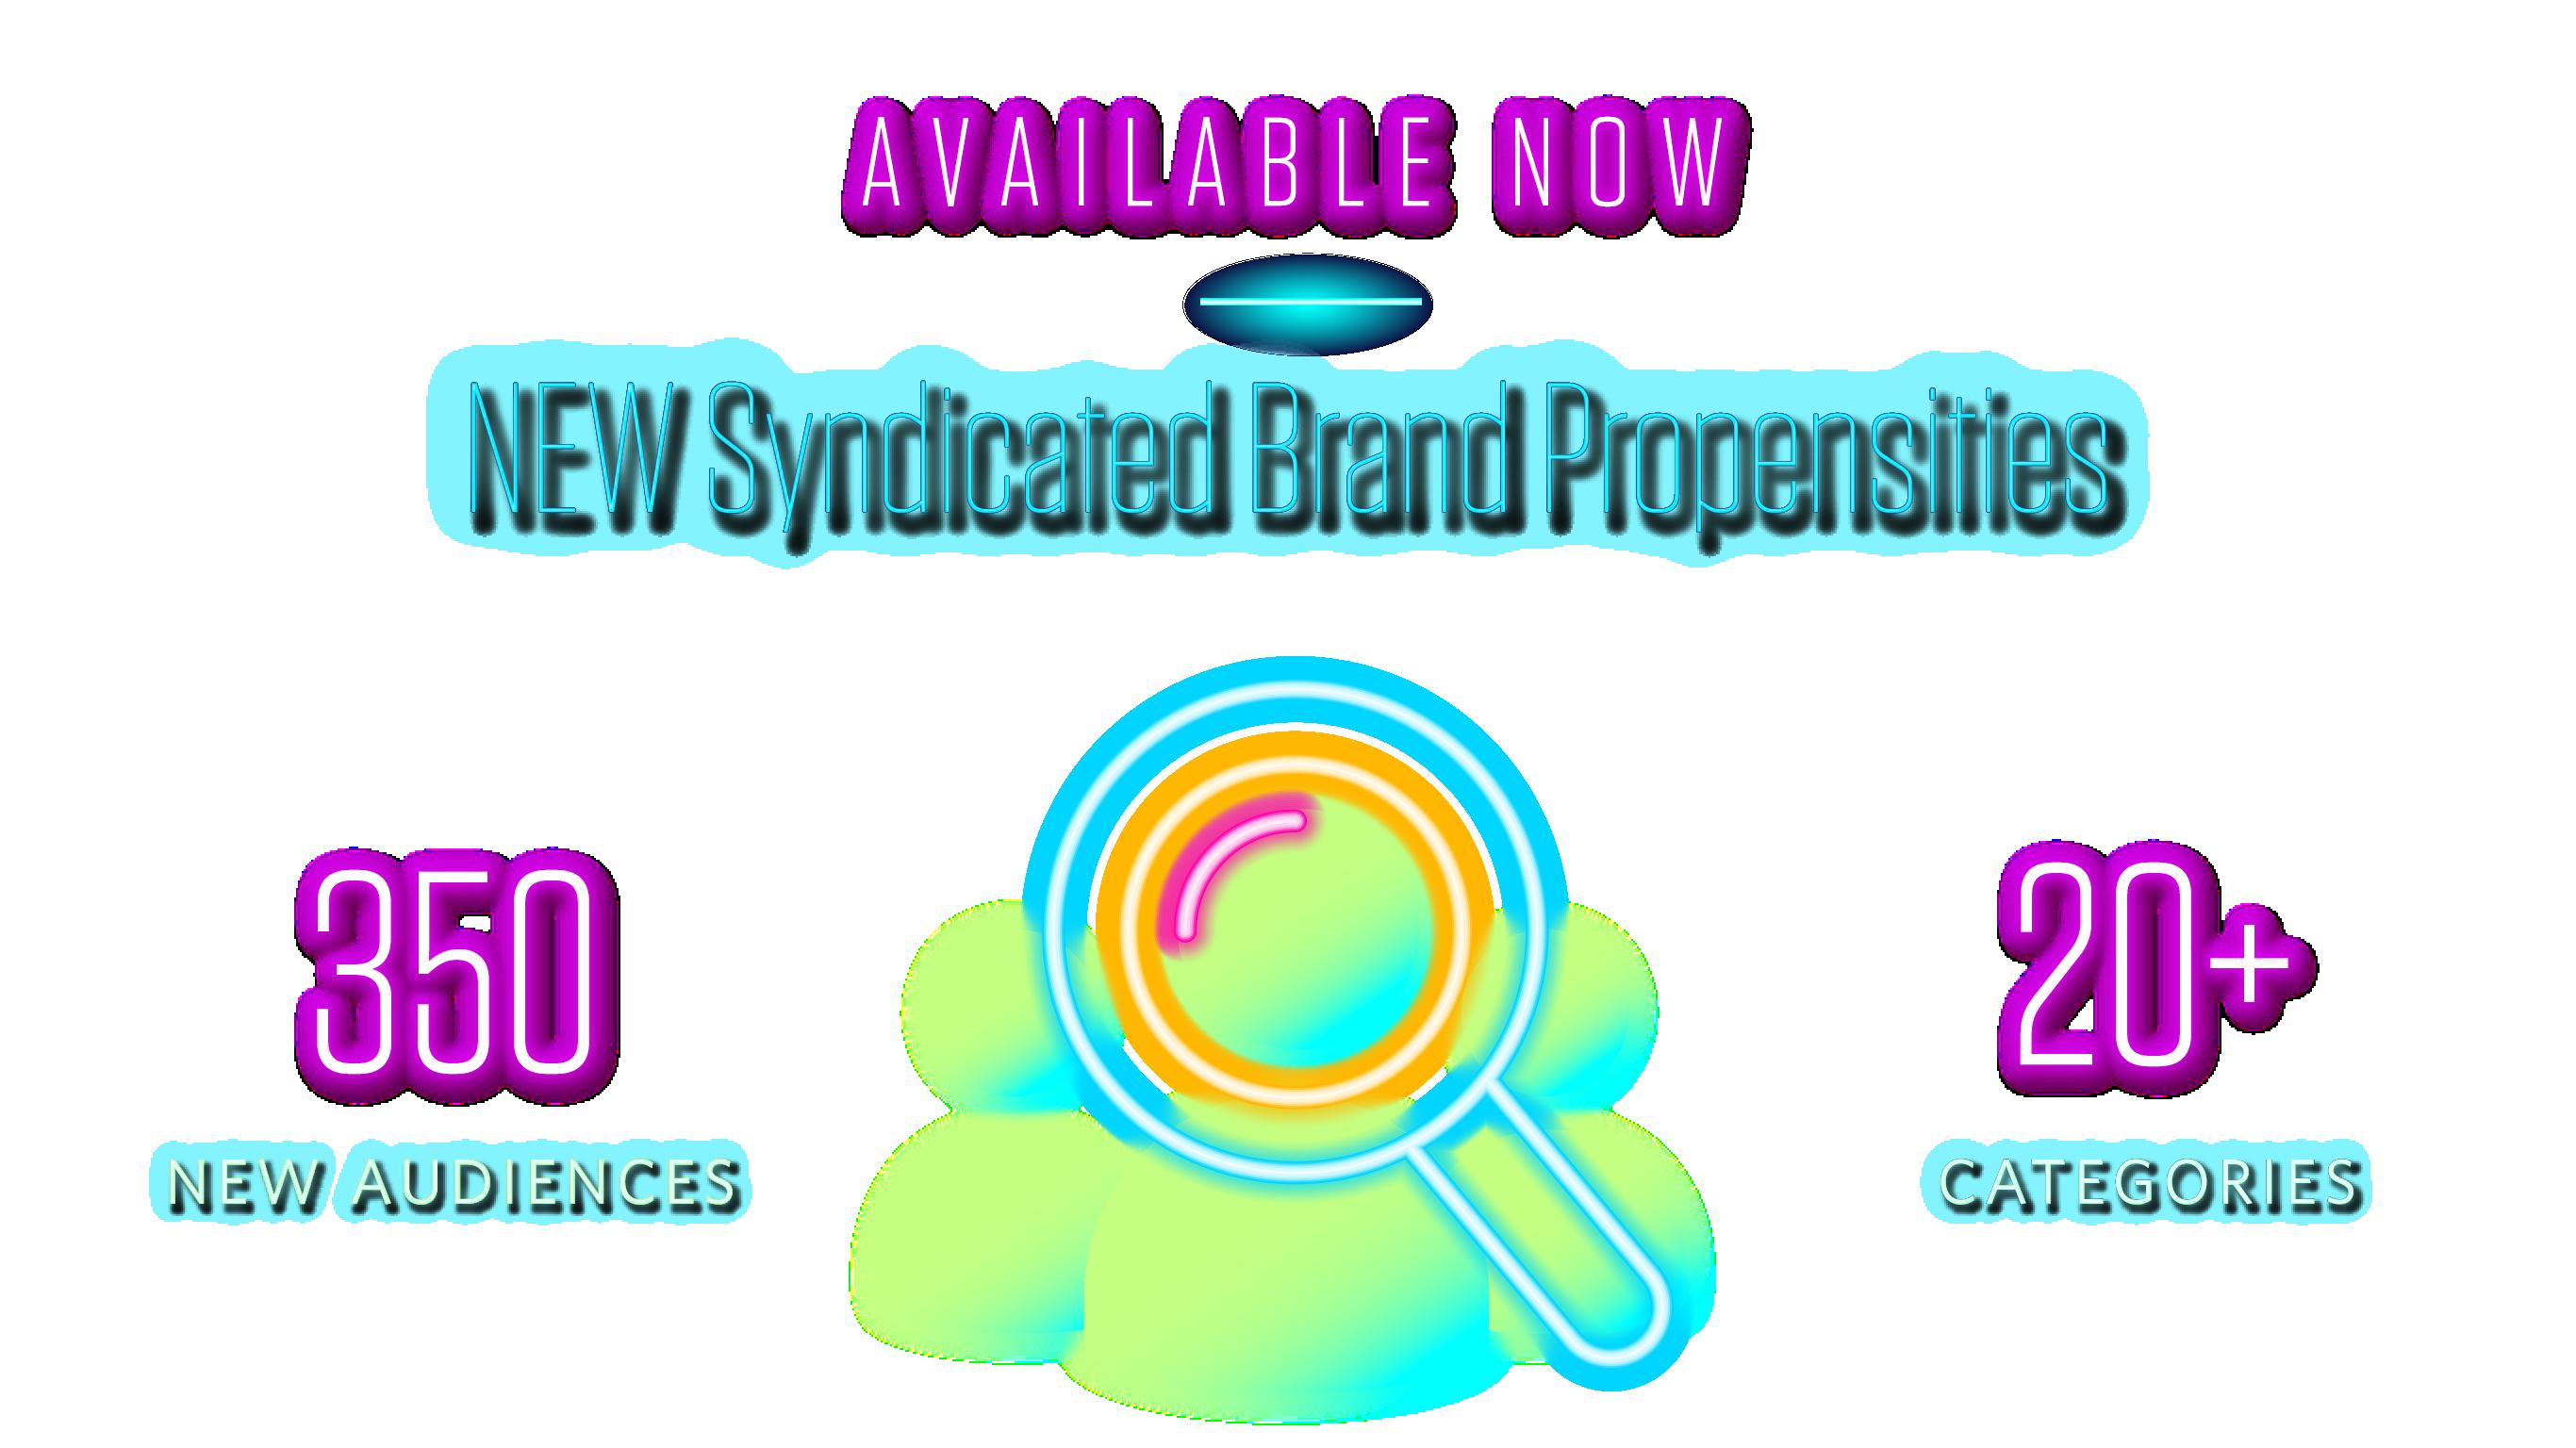 Brand Propensities Announcement@2x